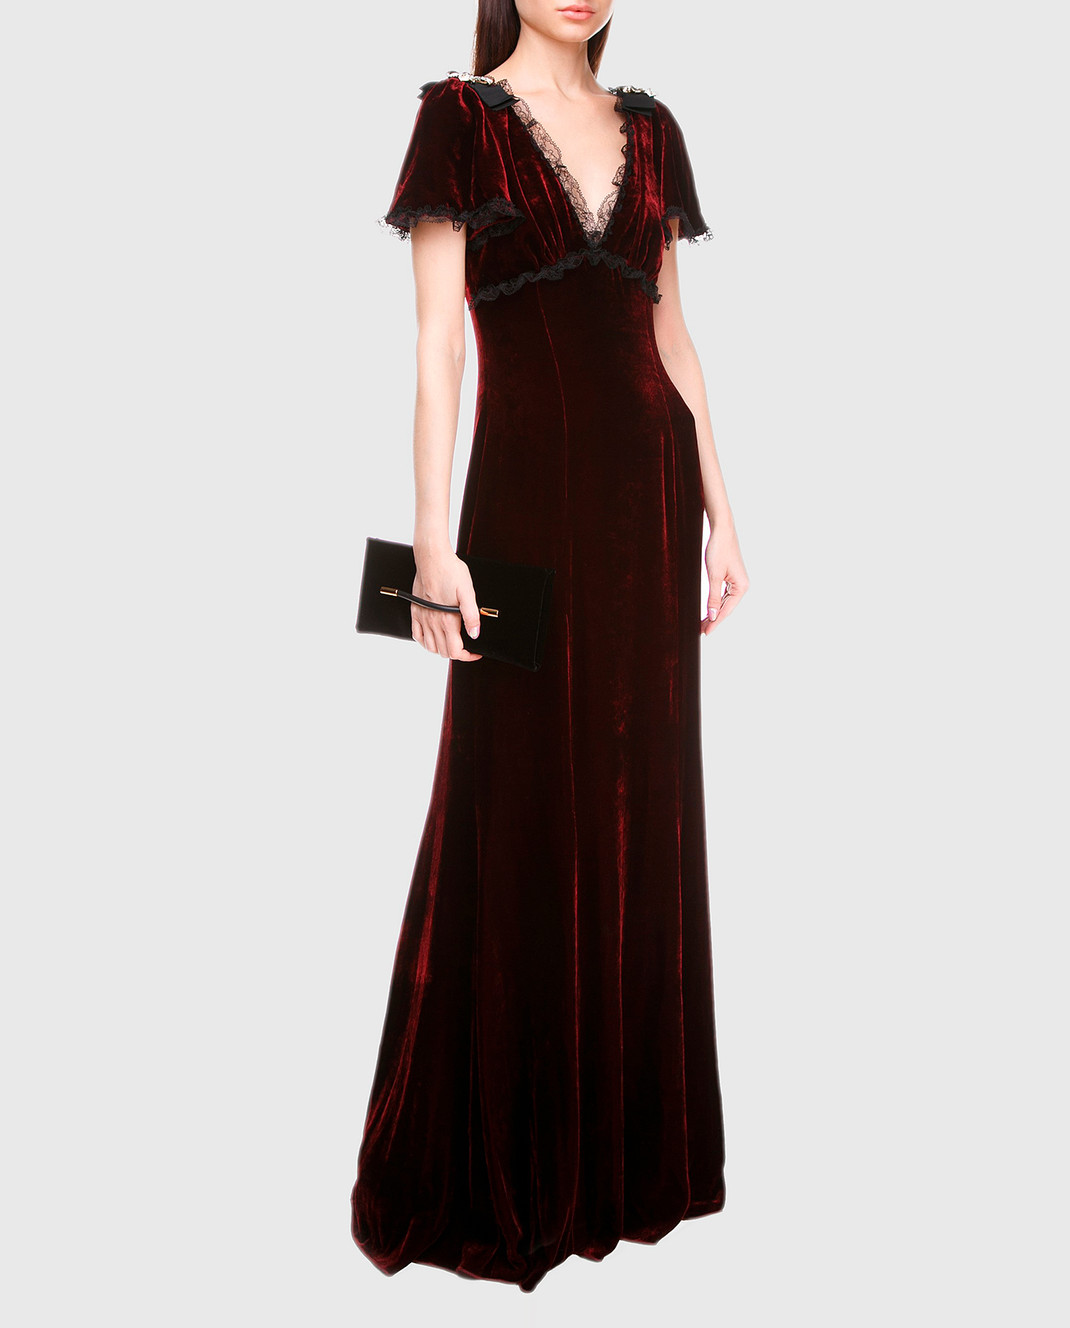 Dolce&Gabbana Бордовое платье F66E1ZFUVH9 изображение 2